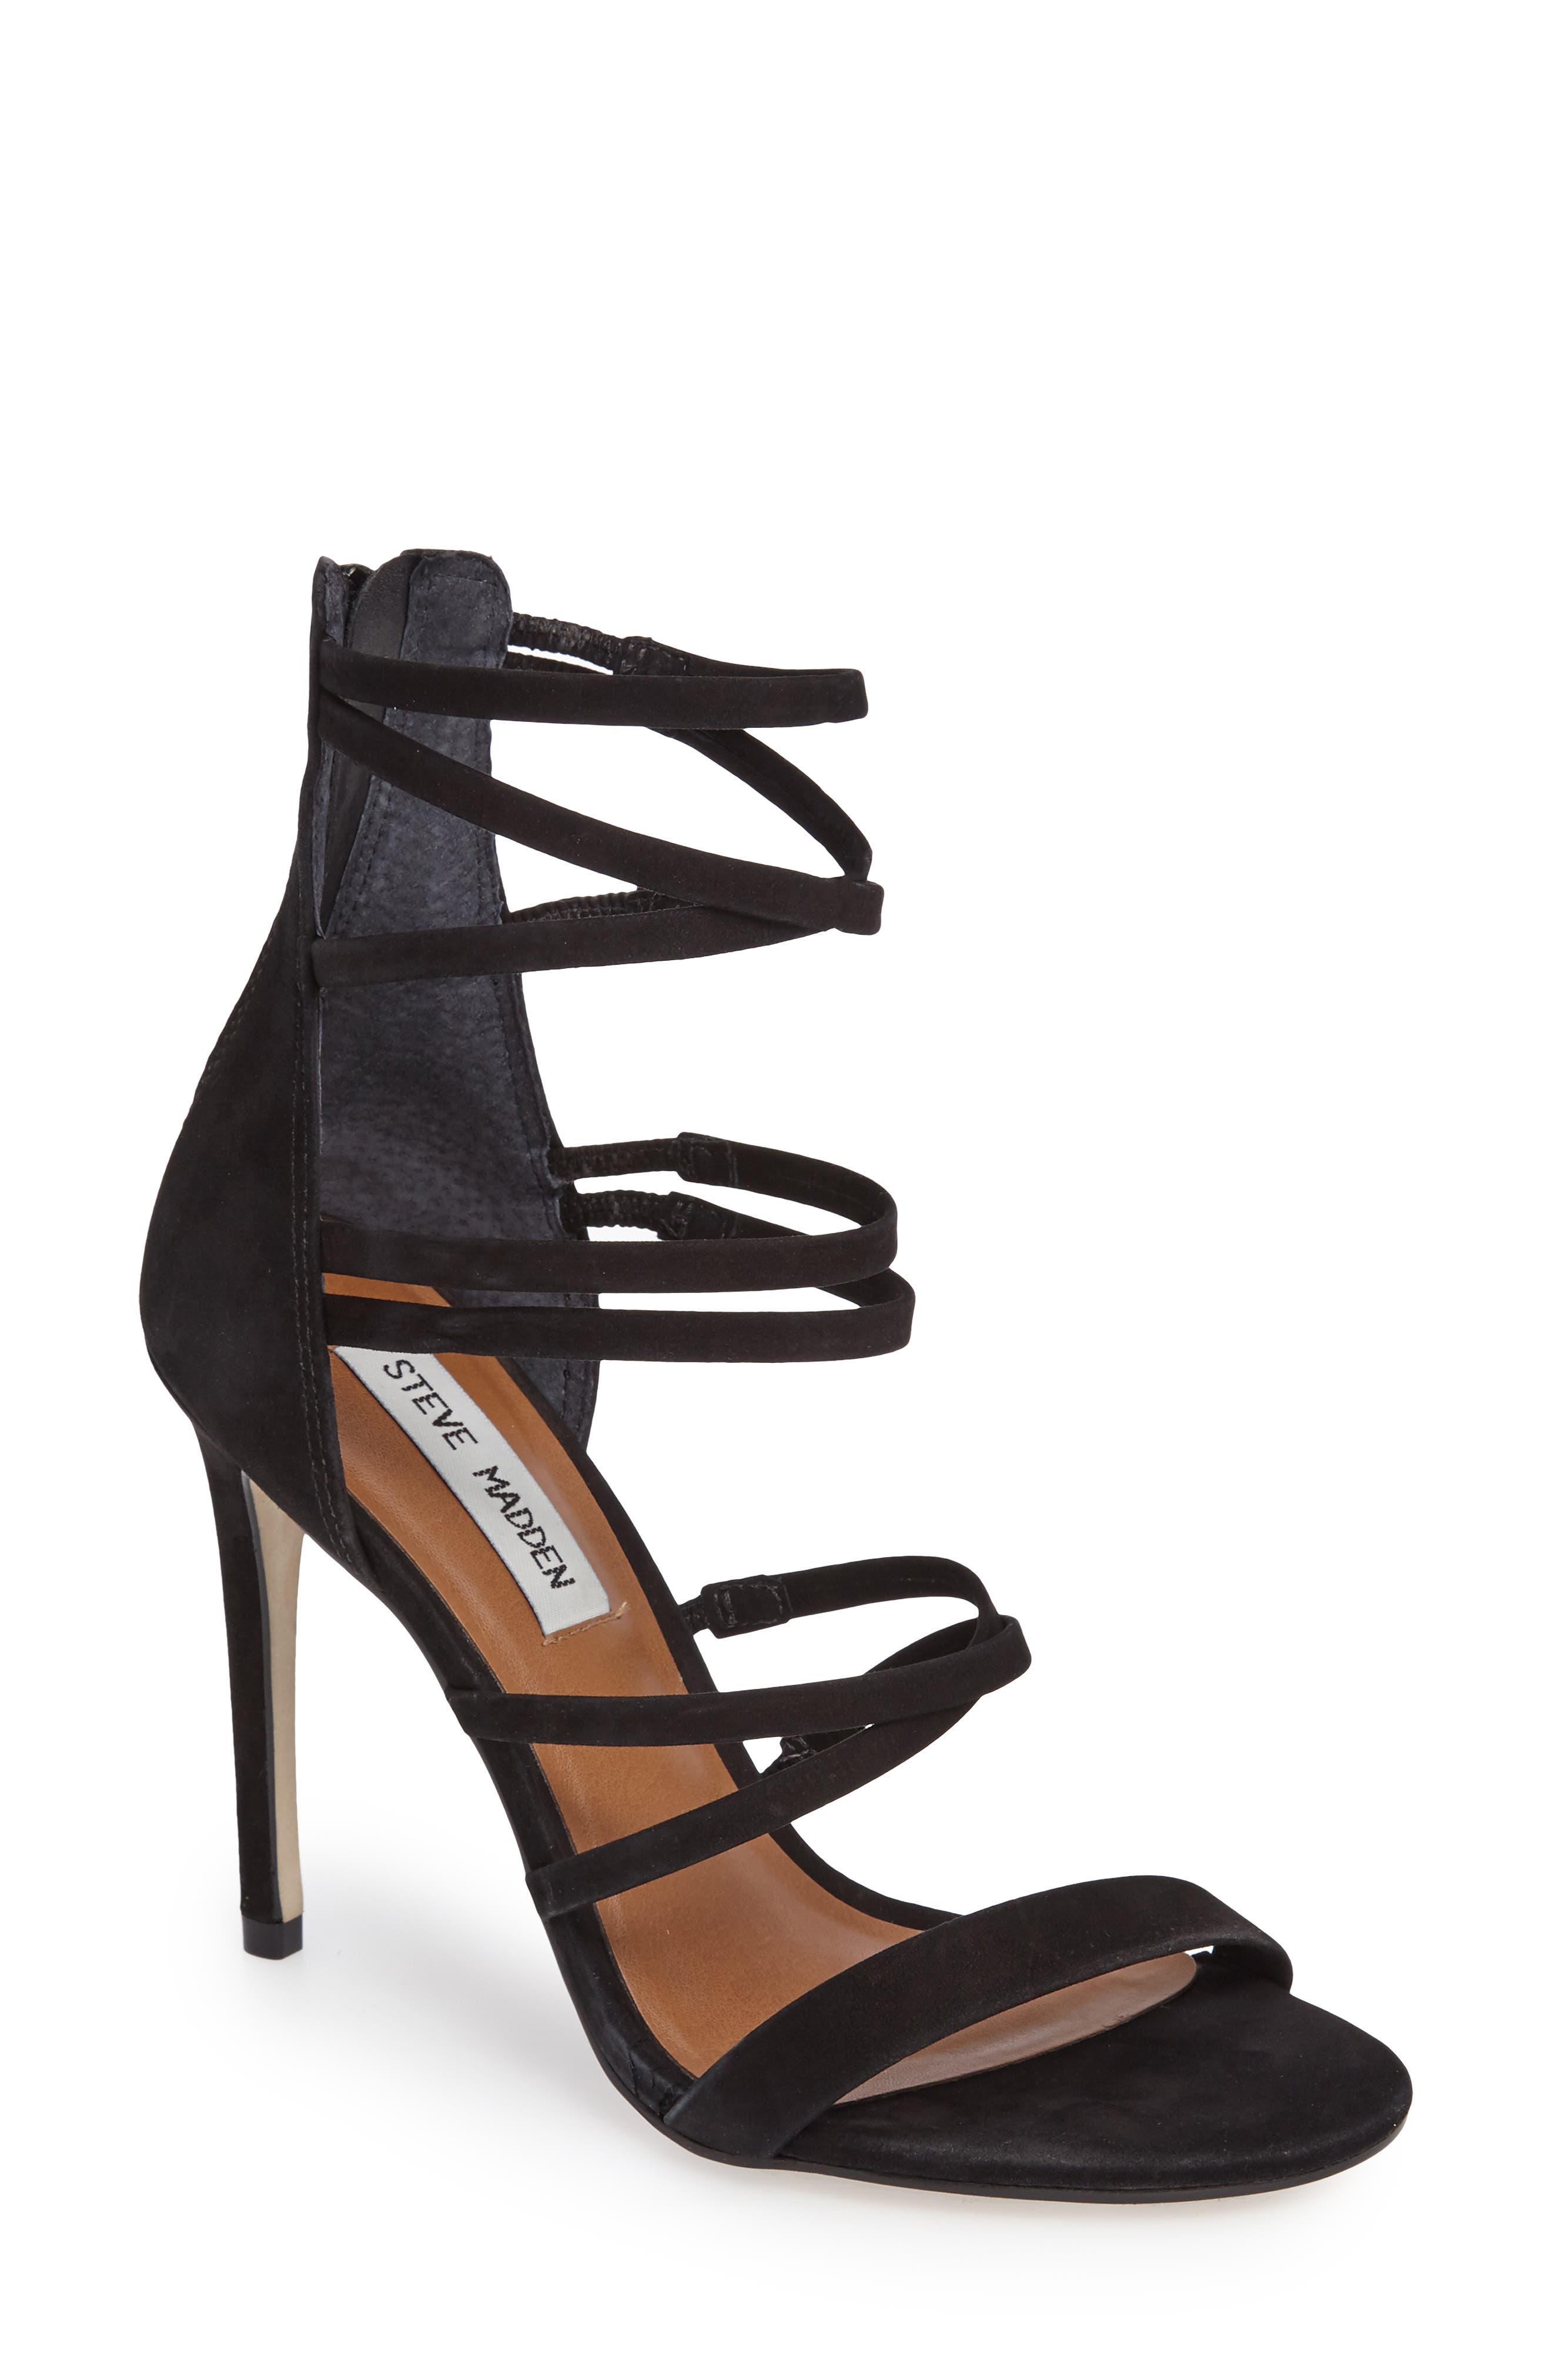 Tierney Sandal,                         Main,                         color, Black Nubuck Leather